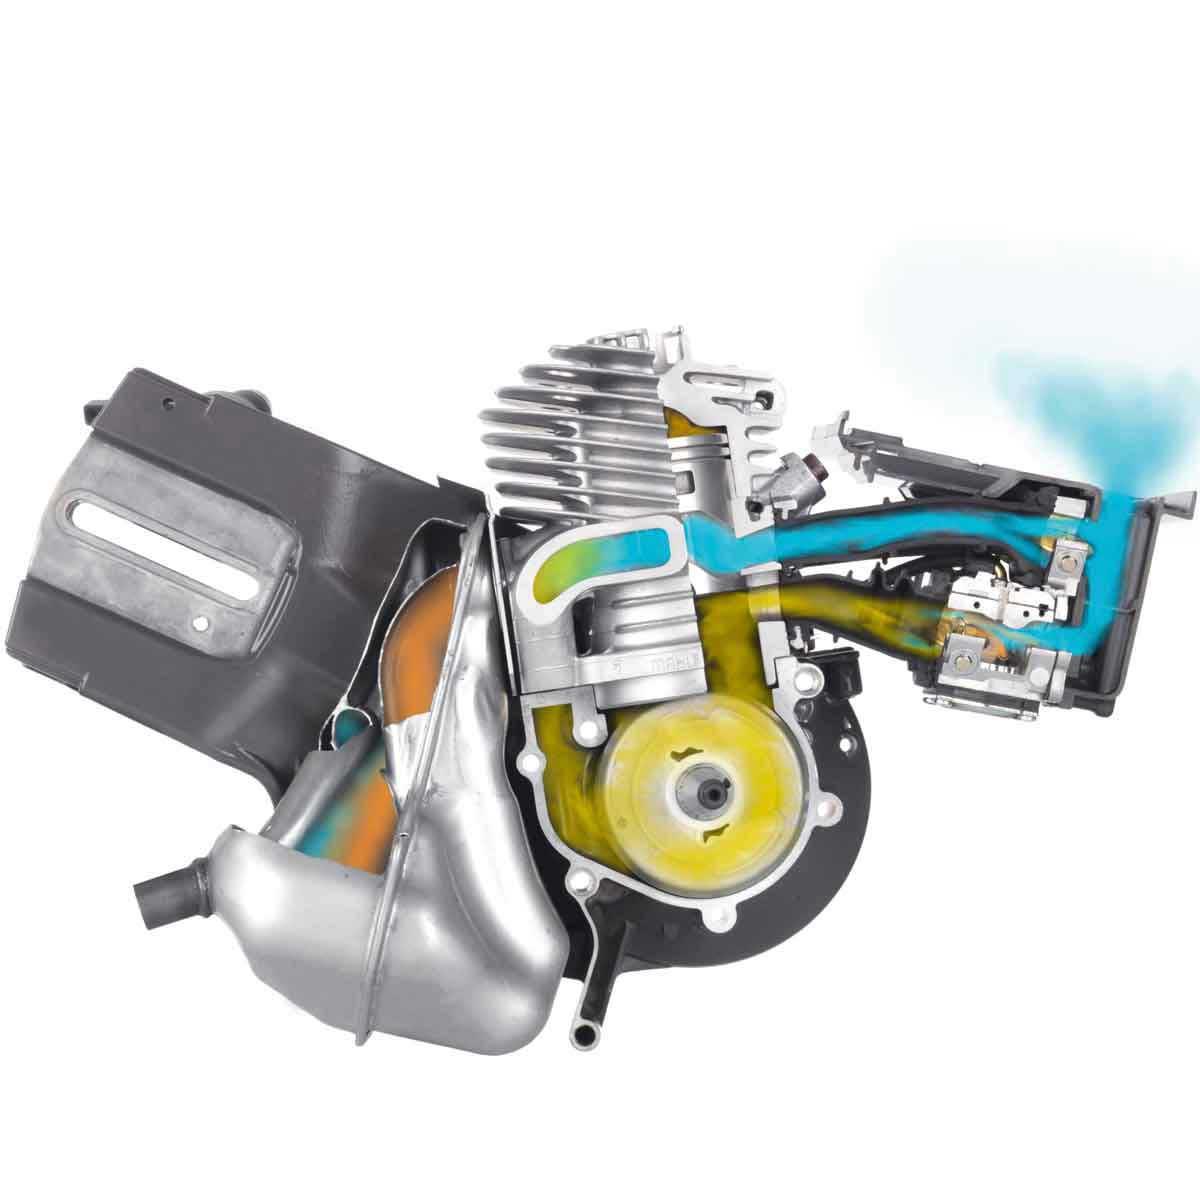 Husqvarna Power cutter carburetor